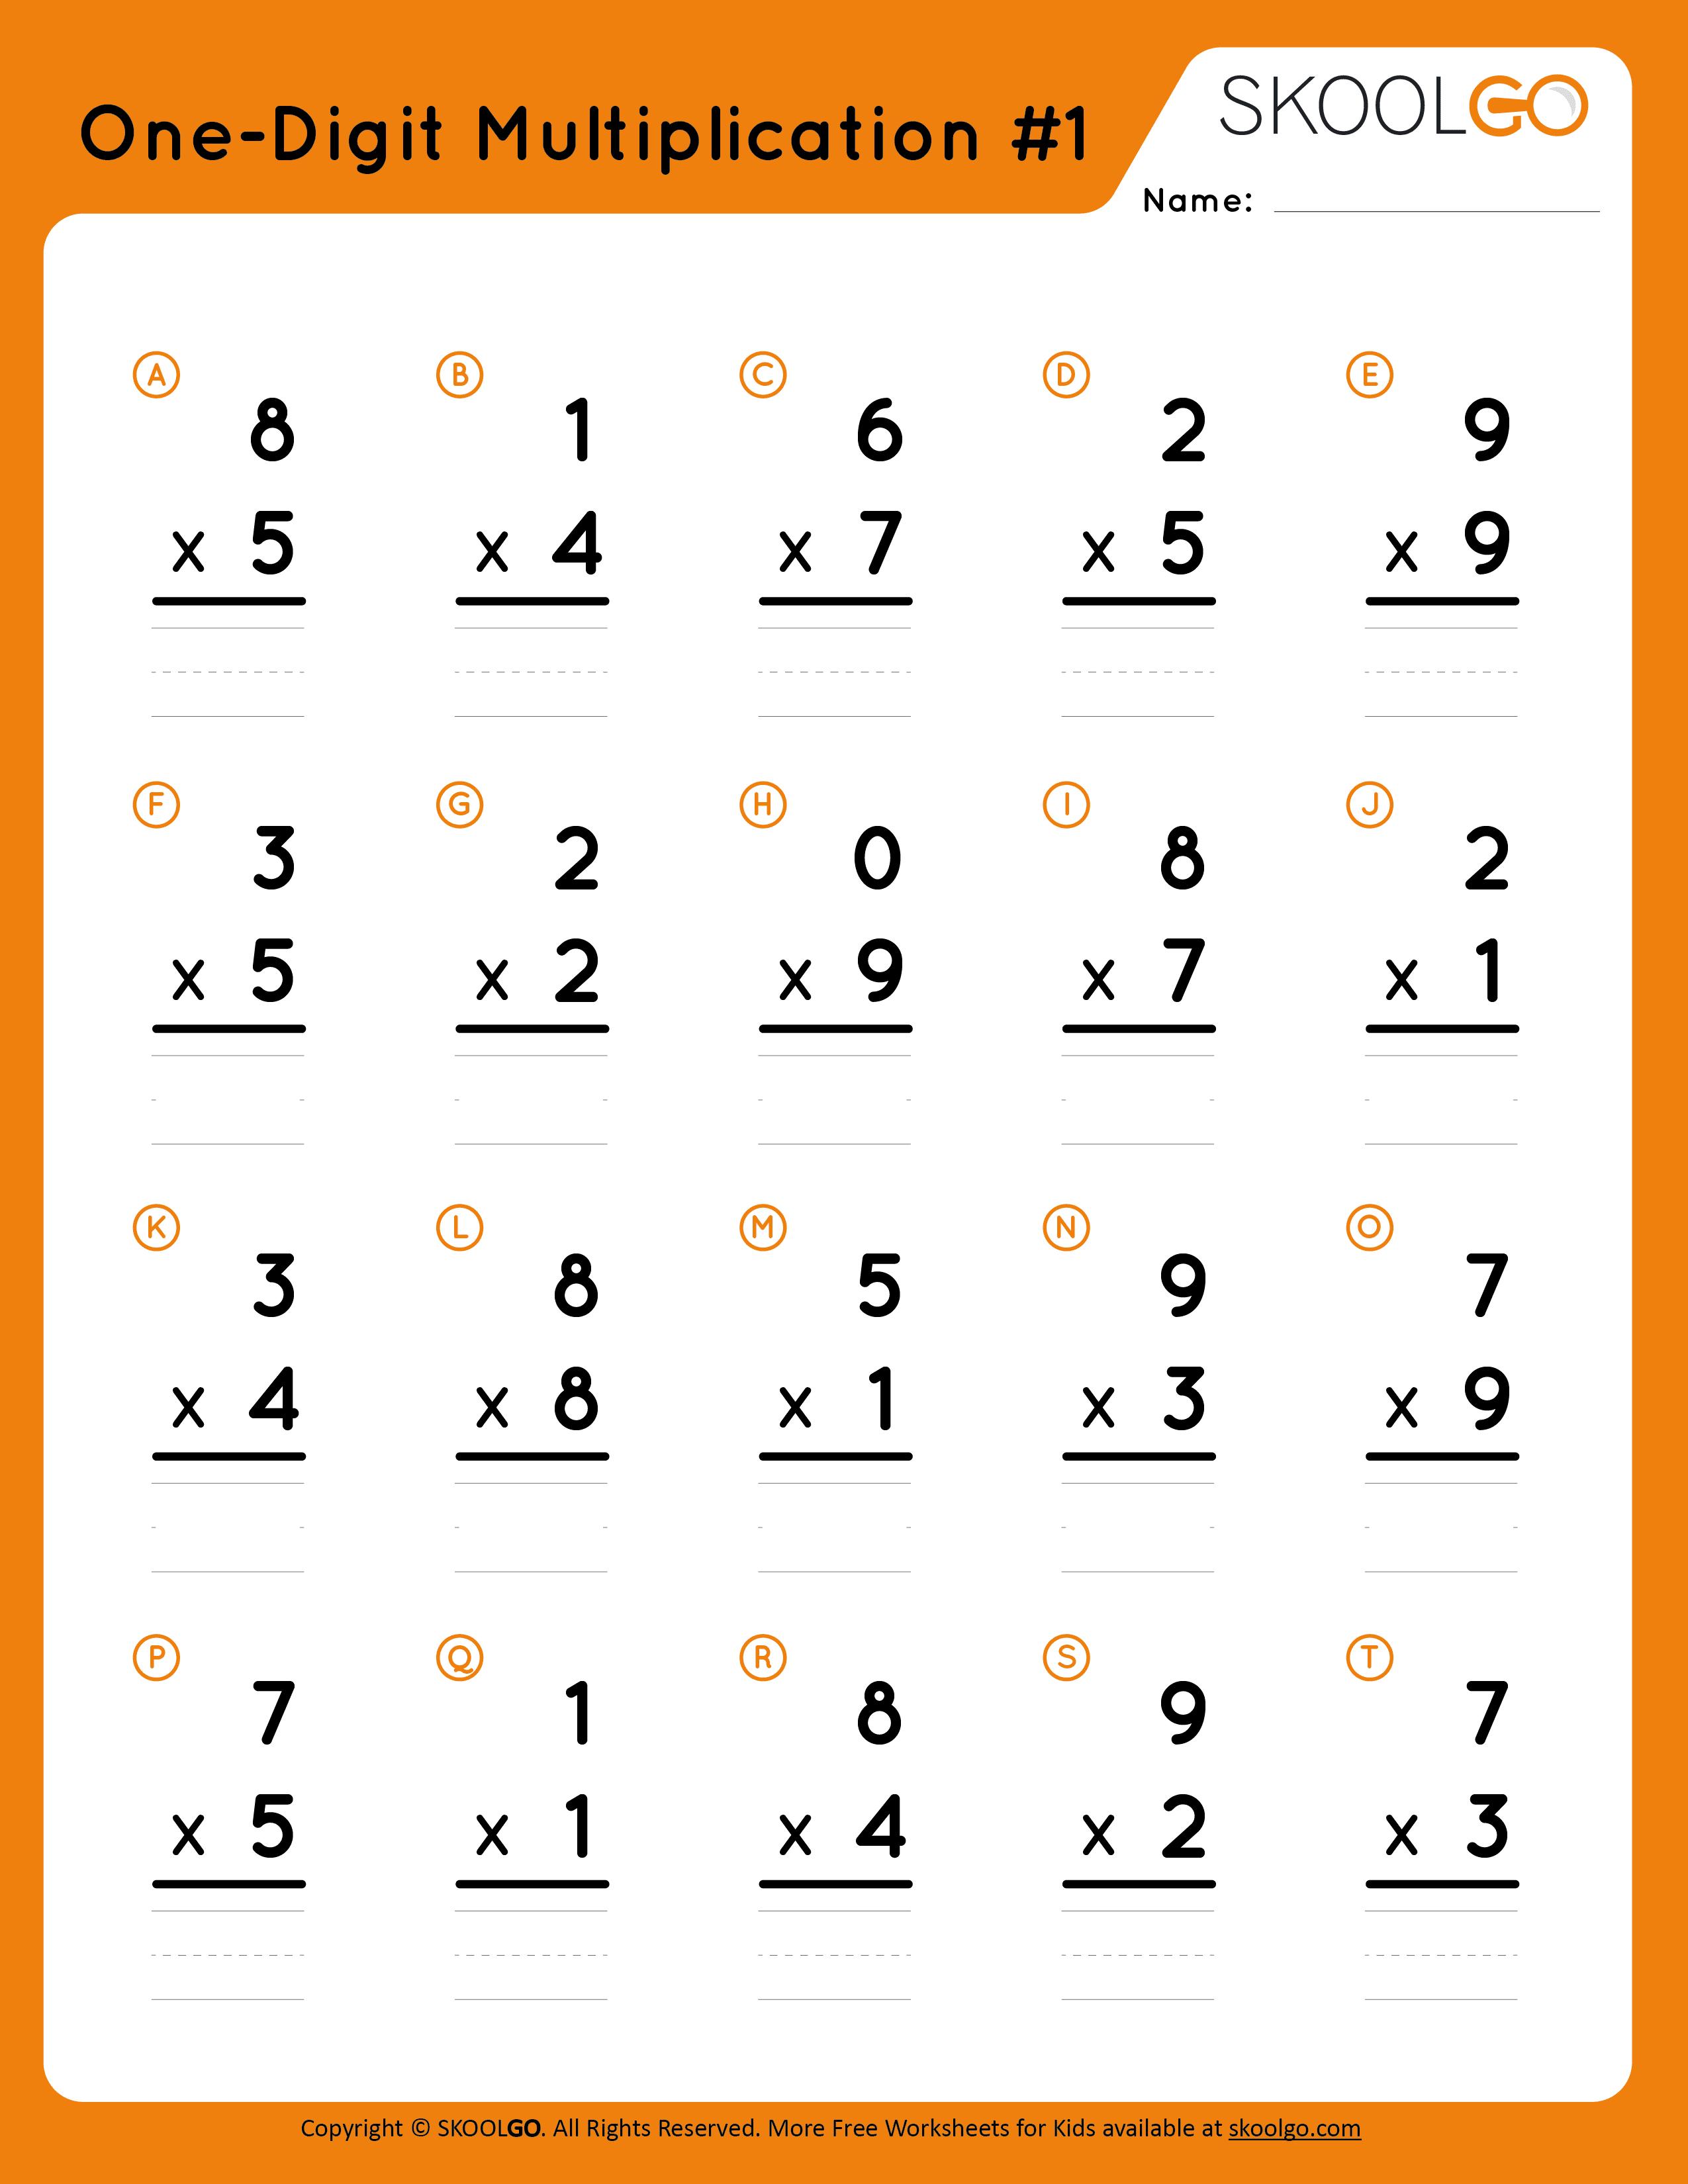 One-Digit Multiplication 1 - Free Worksheet for Kids